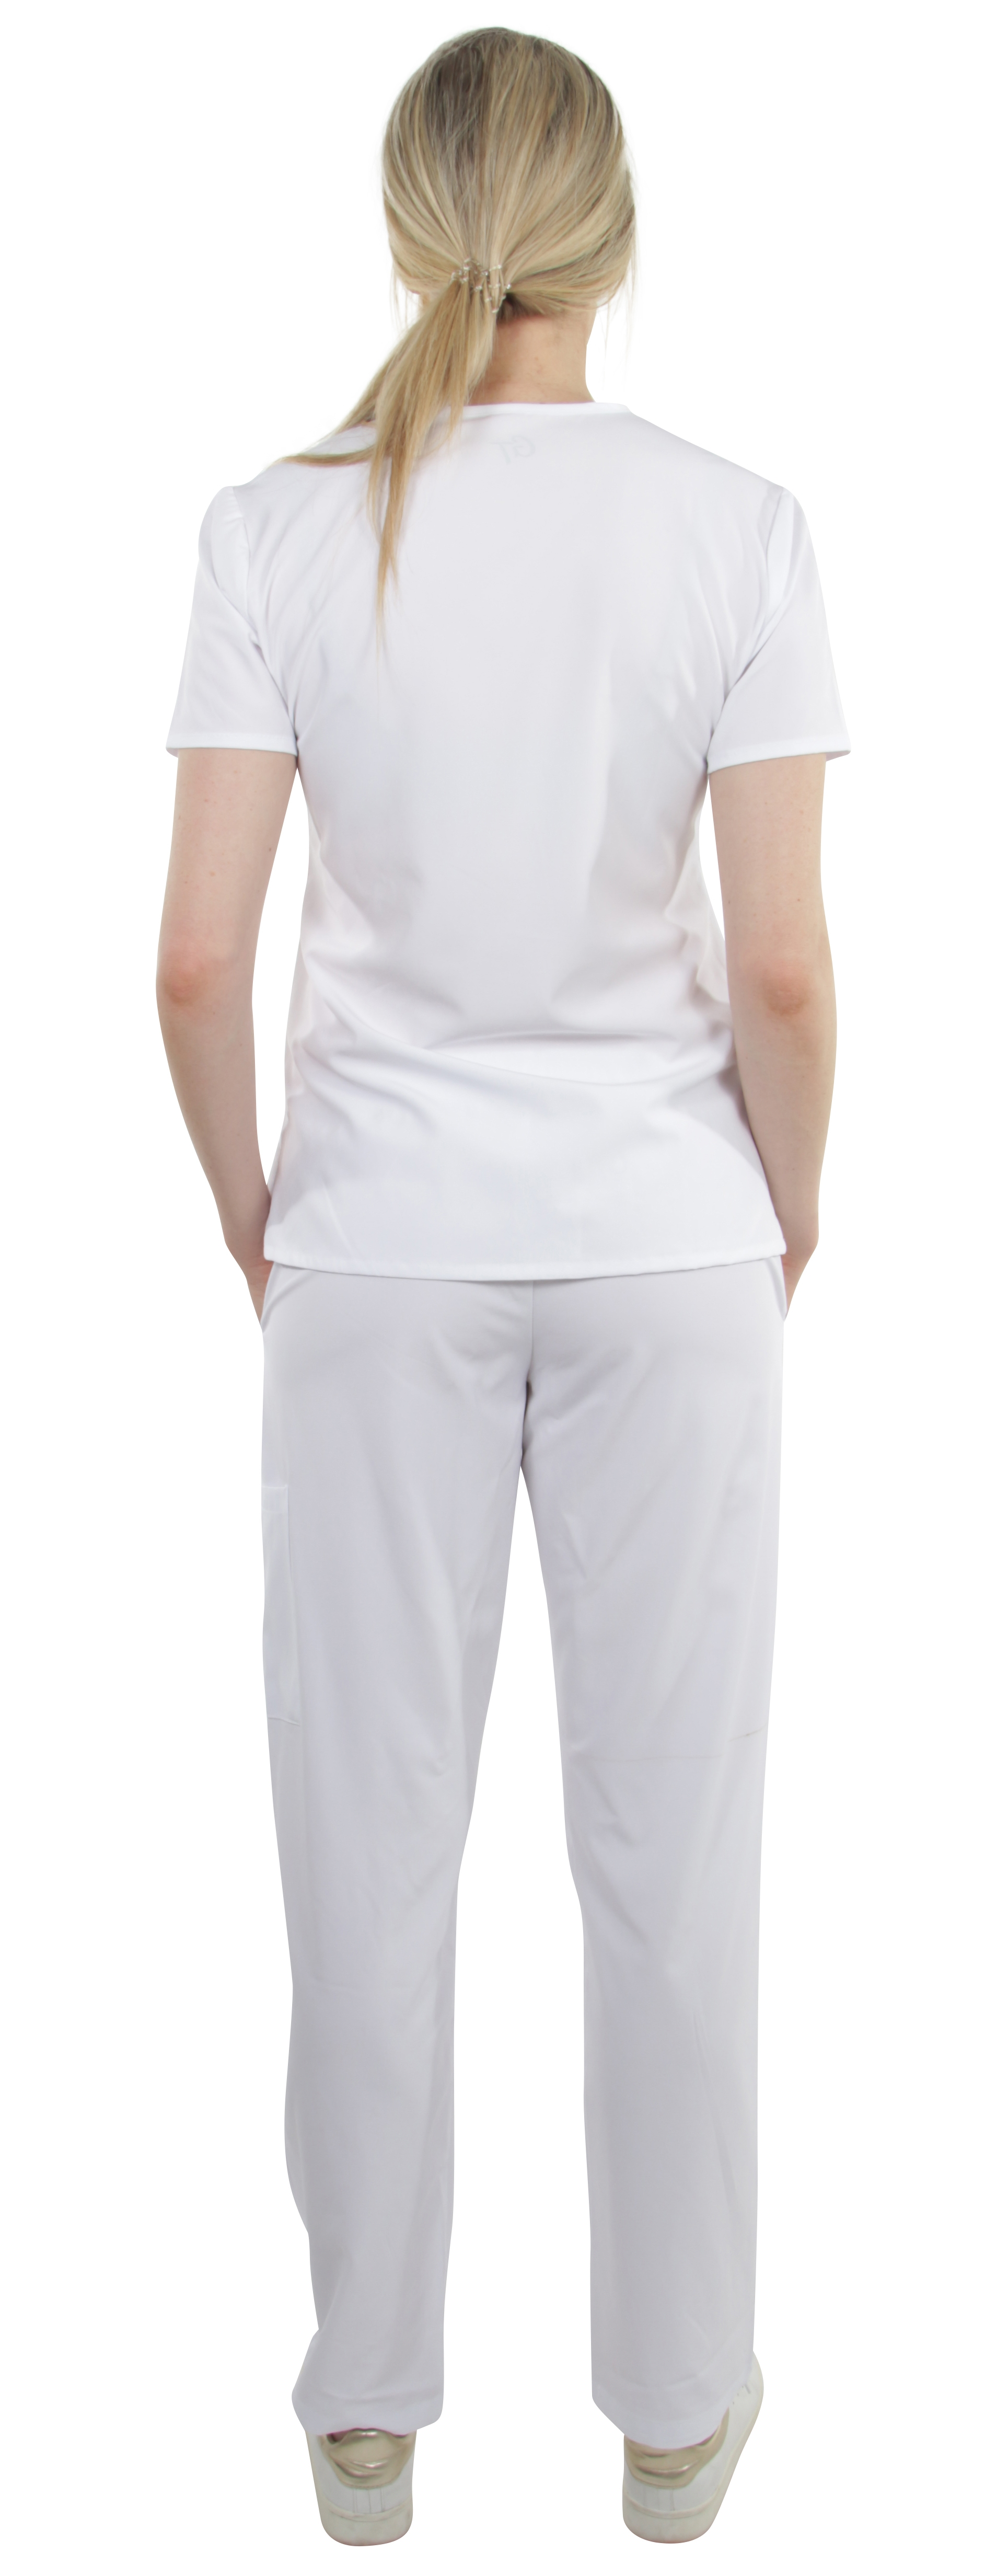 Unisex-Stretch-Medical-Uniform-Five-Pockets-V-Neck-Scrubs-Sets-with-Side-Panels thumbnail 50